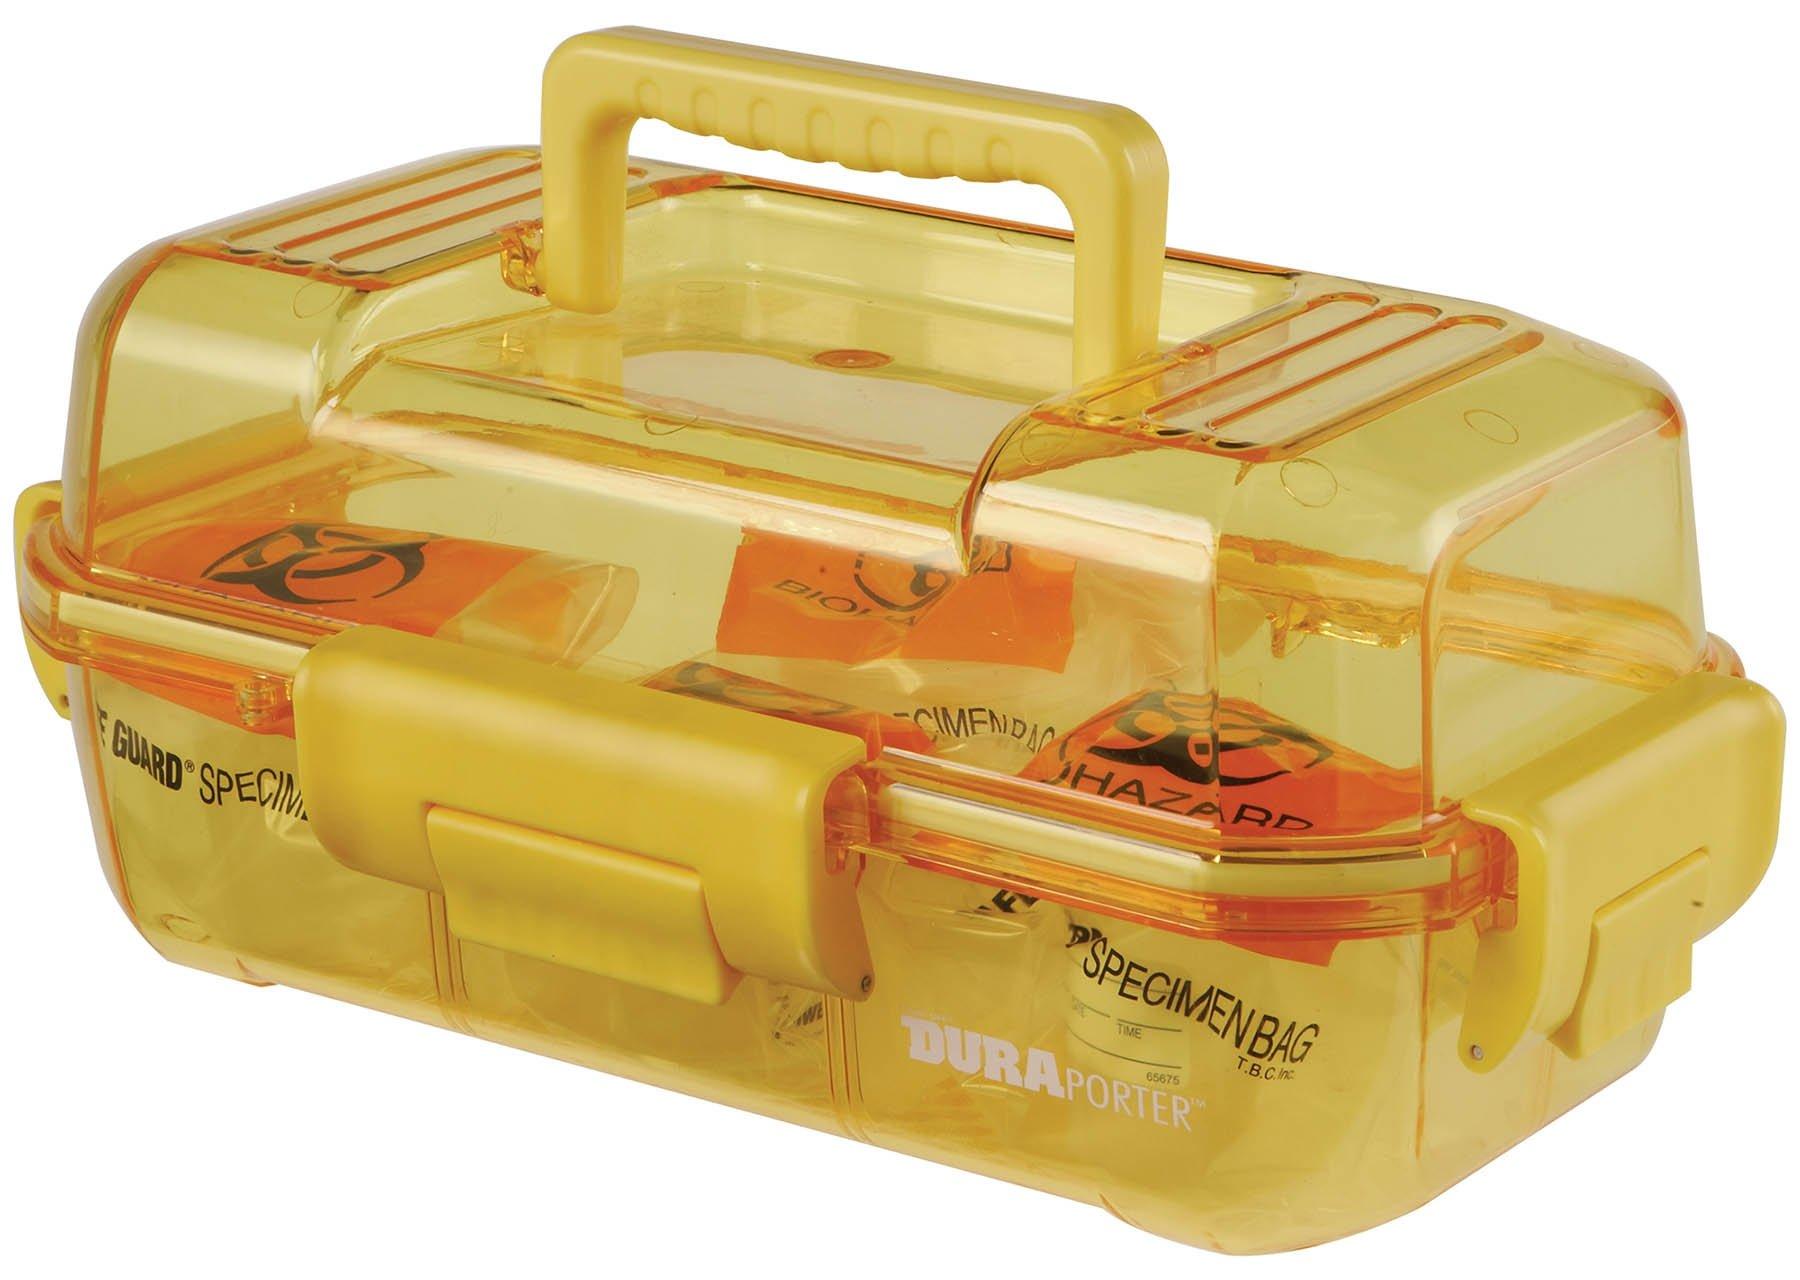 DuraPorter Transport Box - Yellow with Yellow Handle